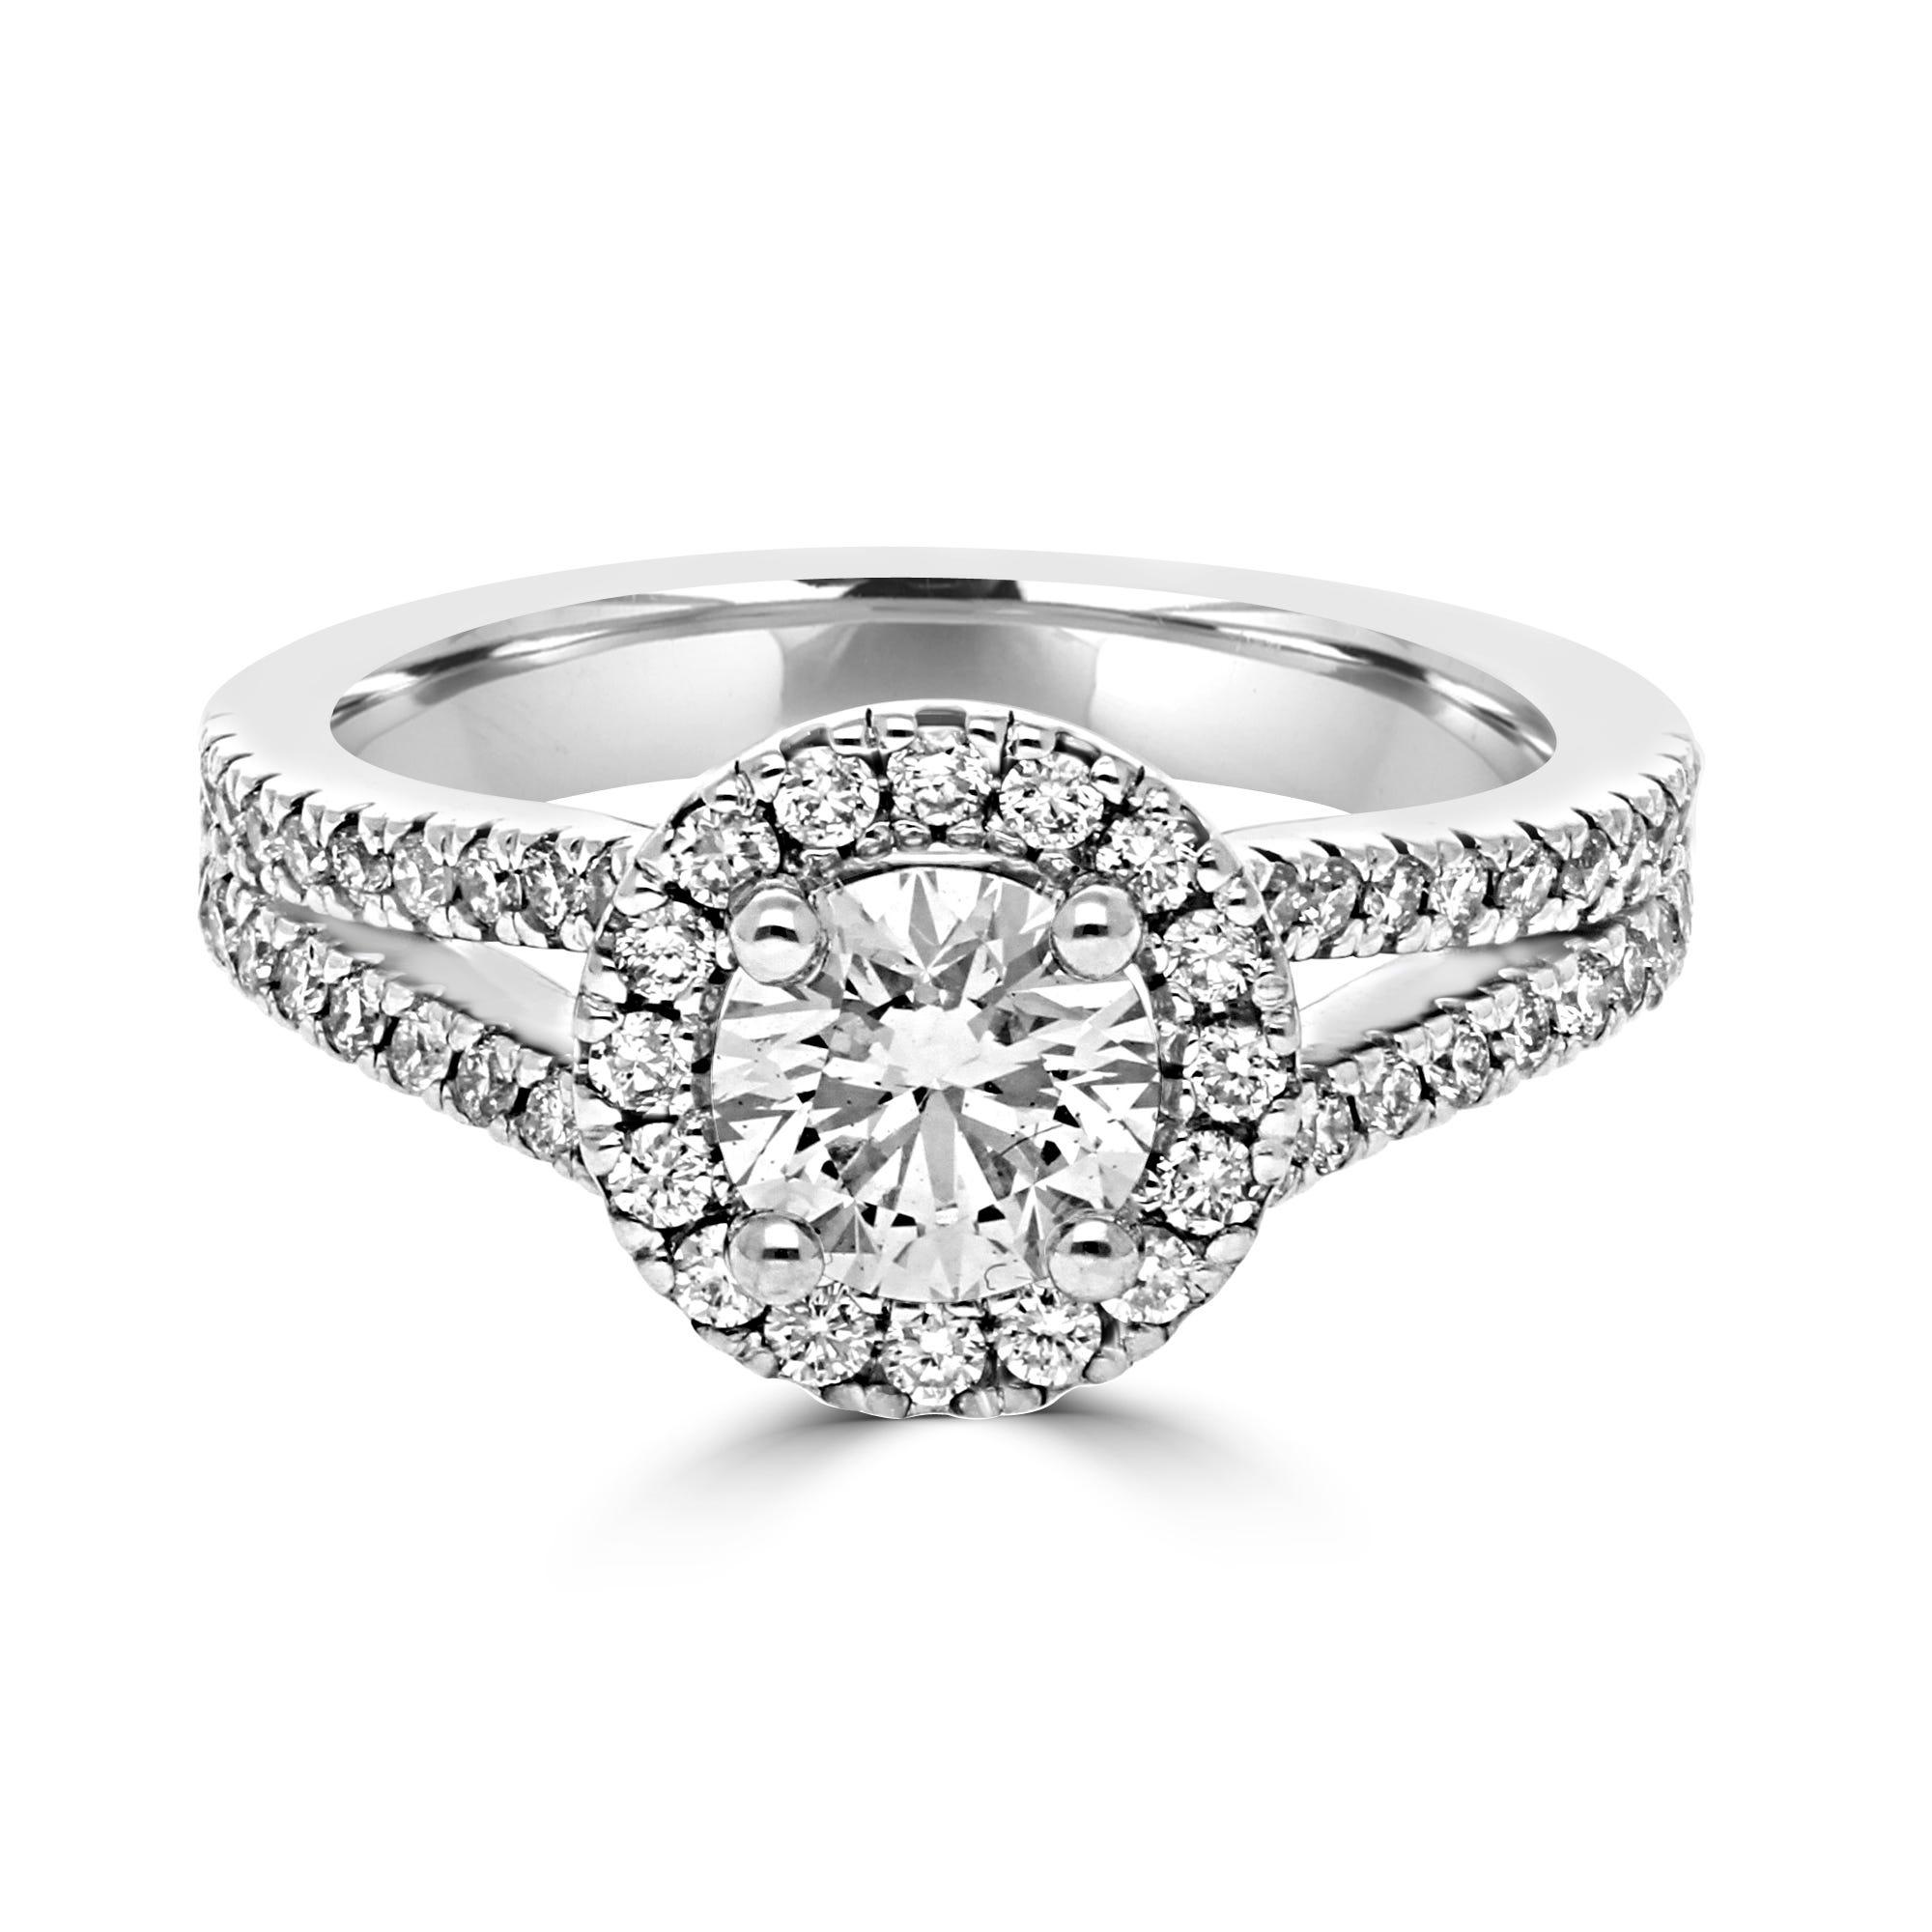 Lab Grown 1 1/2ct. Diamond Split Shank Halo Engagement Ring in 14k White Gold